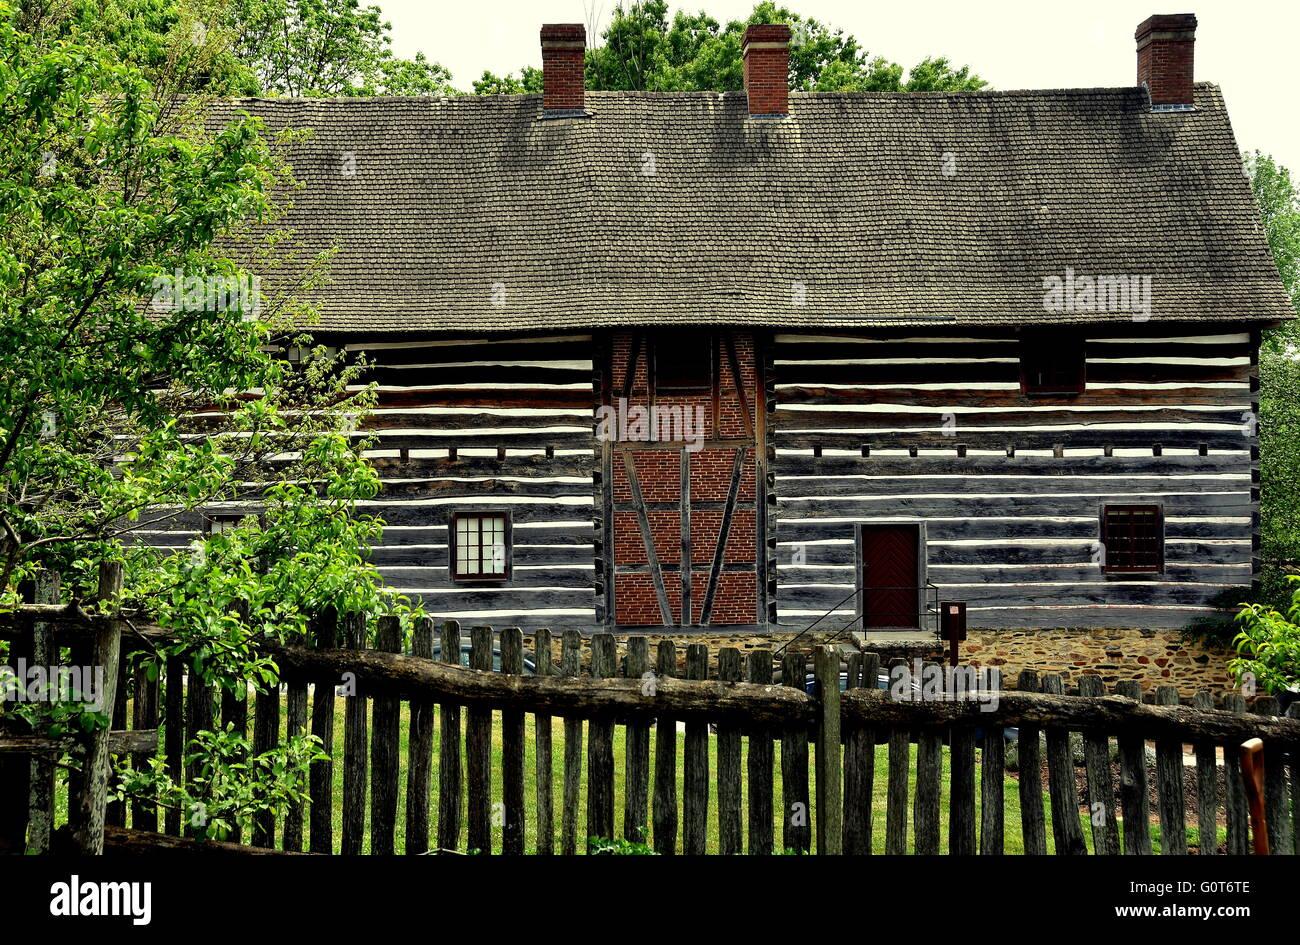 Old Salem, North Carolina:  Fachwerk log and stucco barn at the 1769 Single Brothers' House - Stock Image